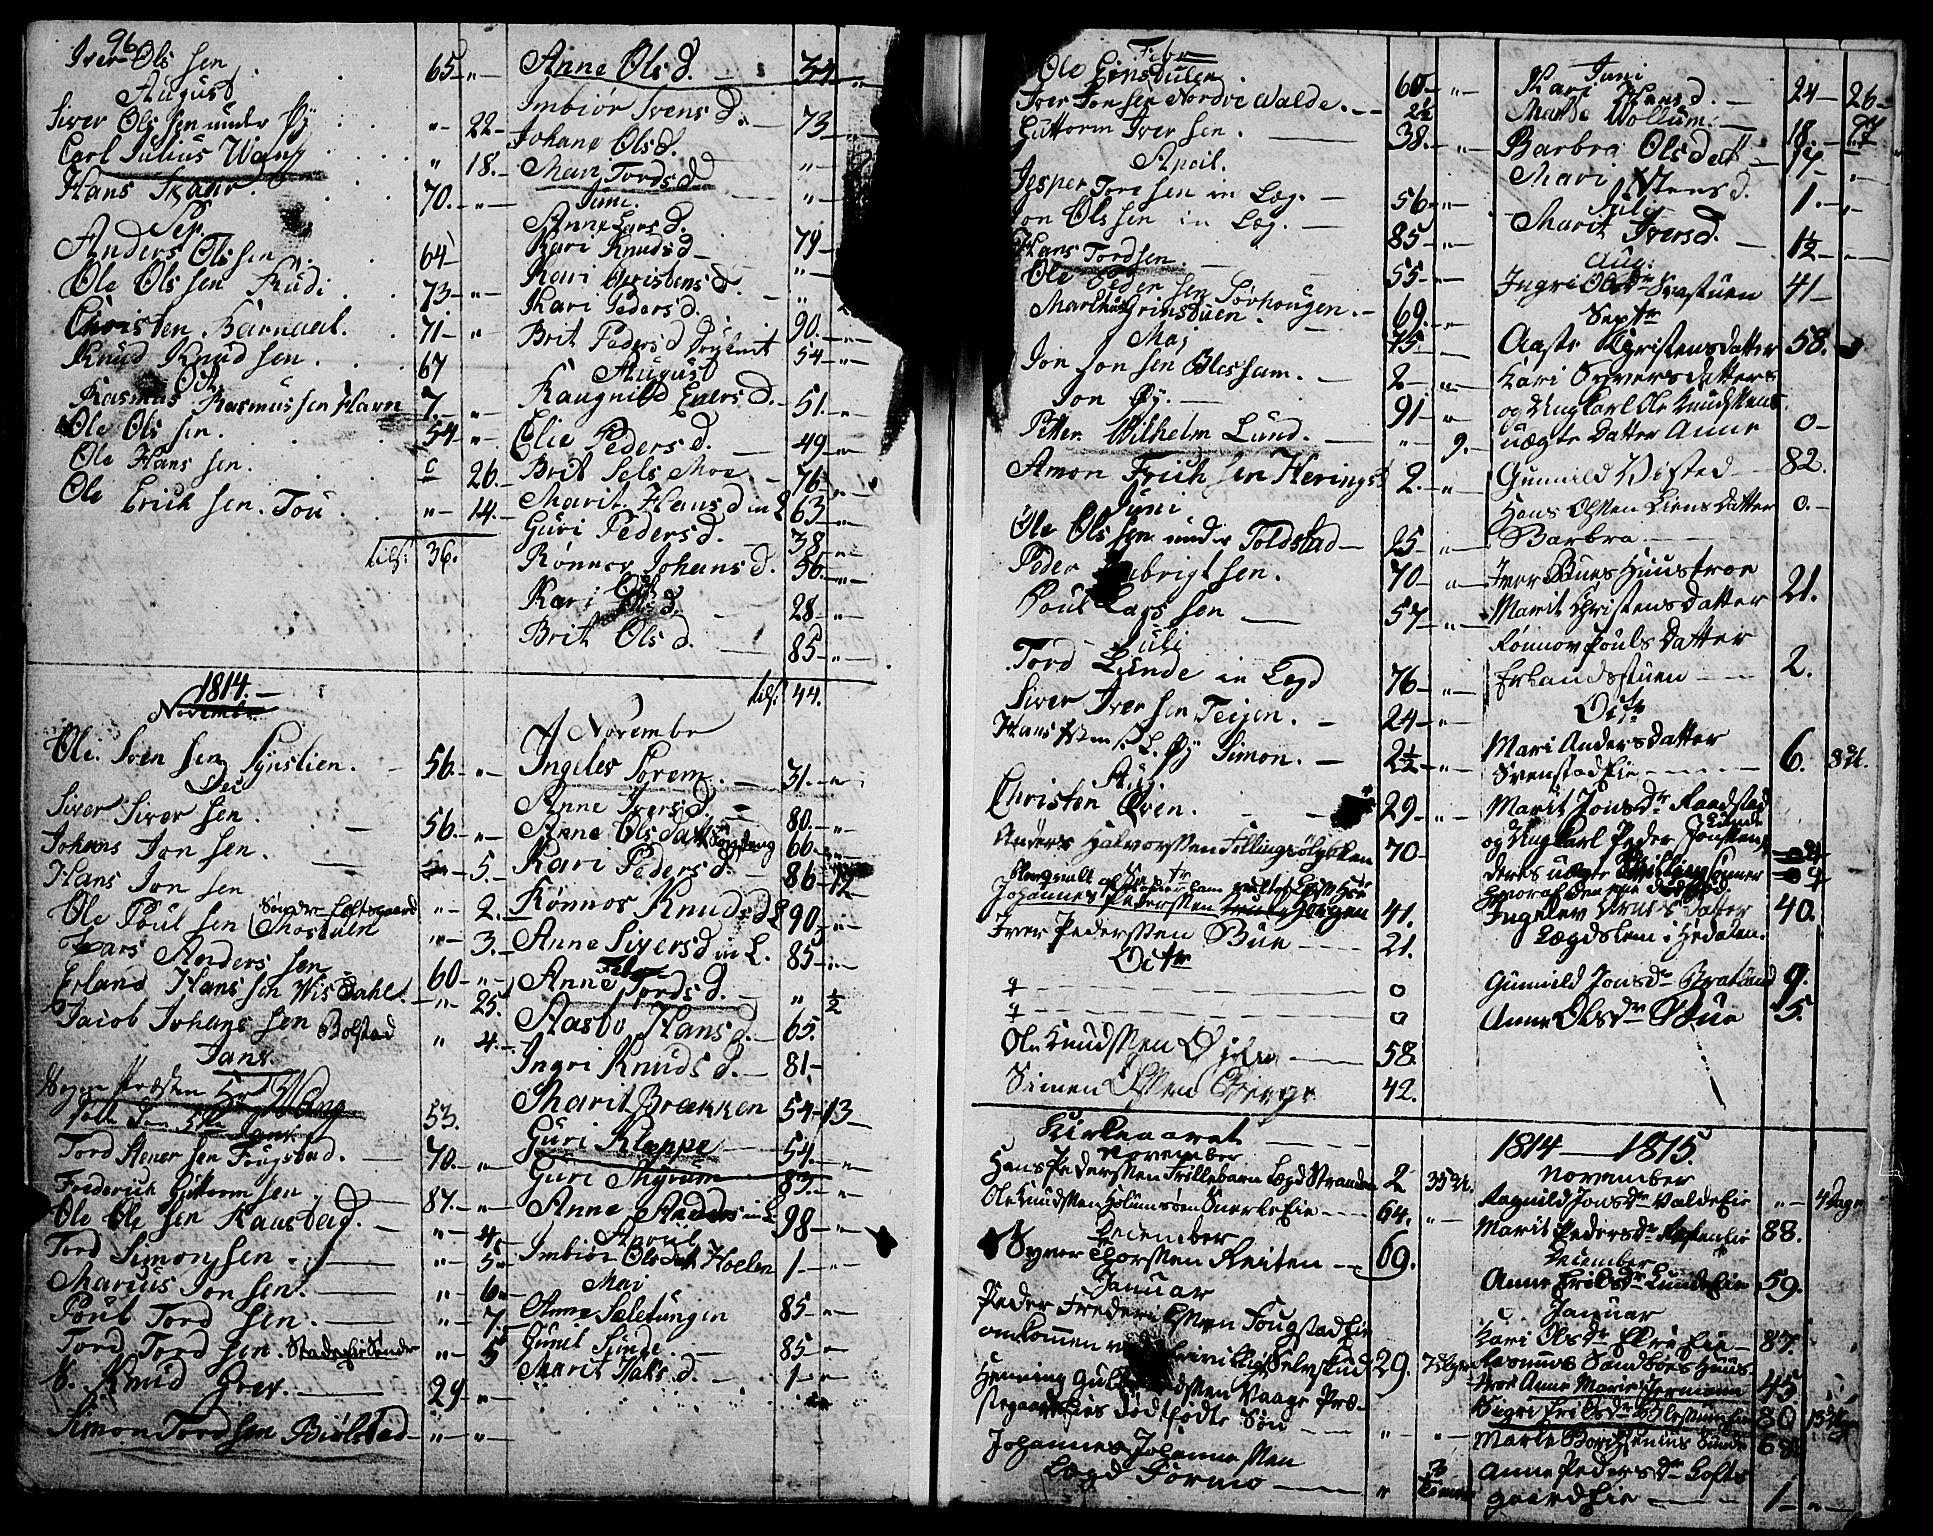 SAH, Vågå prestekontor, Ministerialbok nr. 2, 1810-1815, s. 96-97